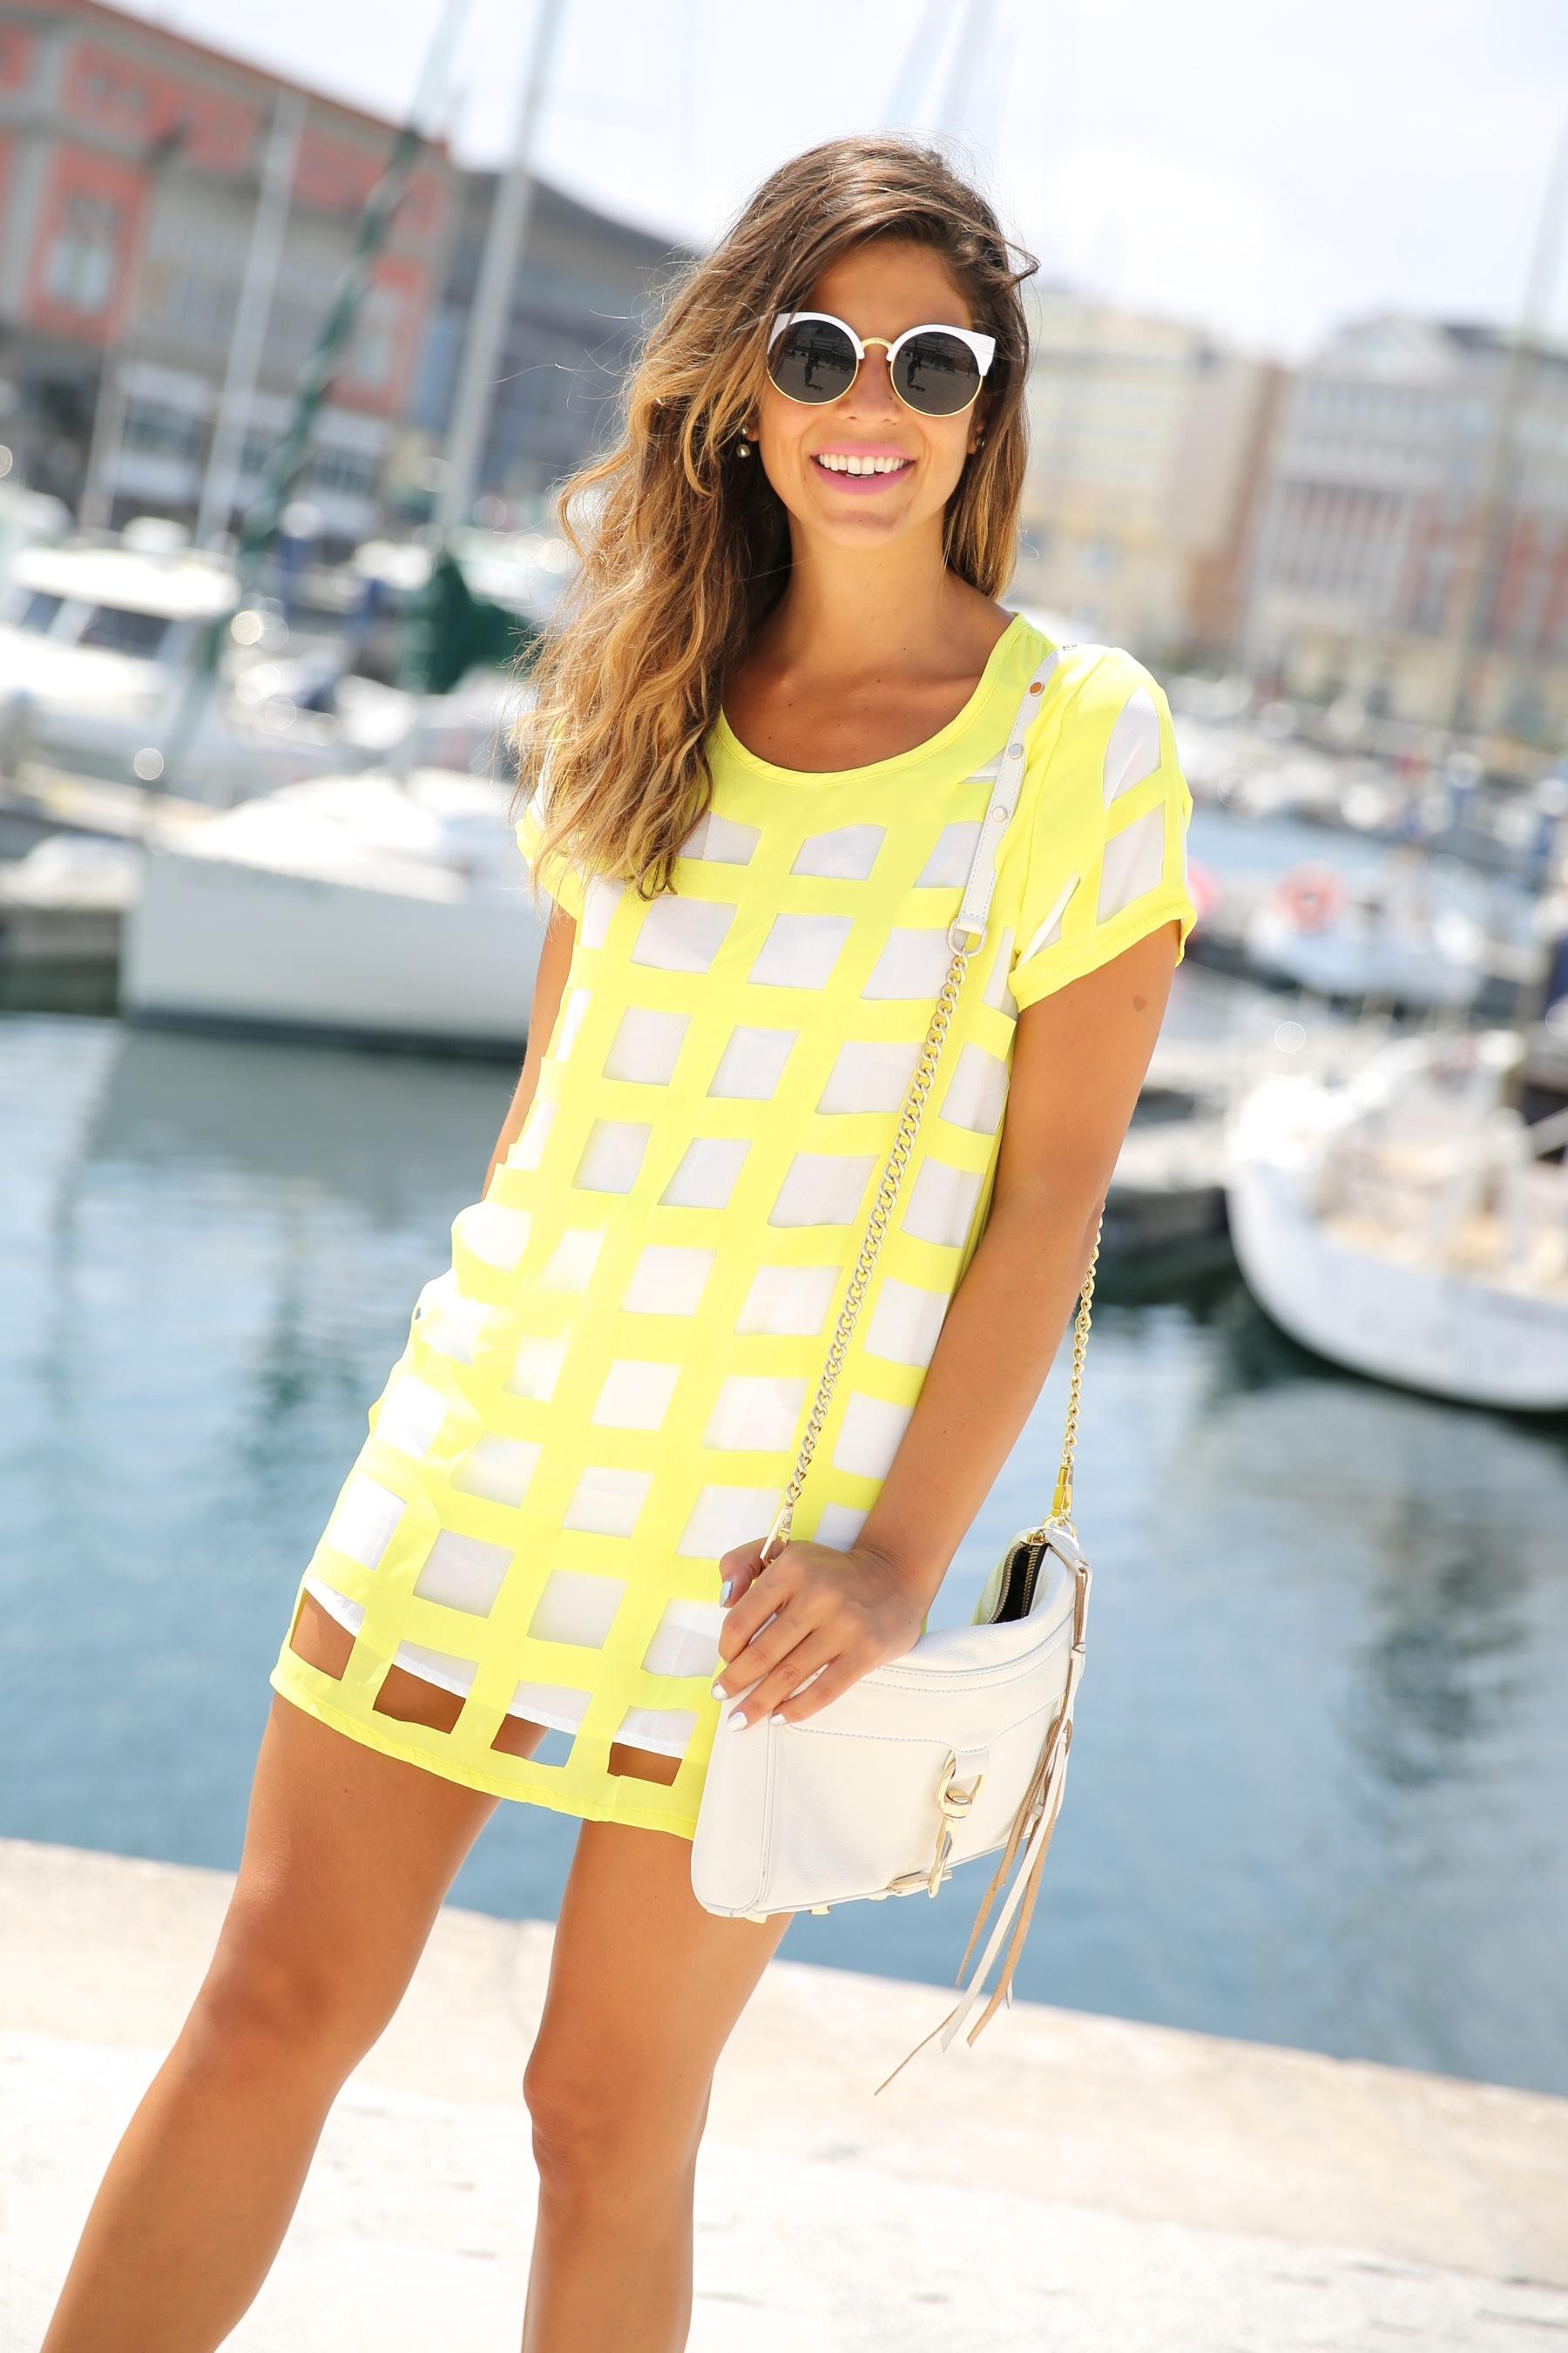 trendy_taste-look-outfit-street_style-ootd-blog-blogger-moda_españa-fashion_spain-coruña-galicia-sandalias_plataforma-platform_sandals-rebecca_minkoff-yellow-amarillo-vestido-dress-plaid-cuadros-7